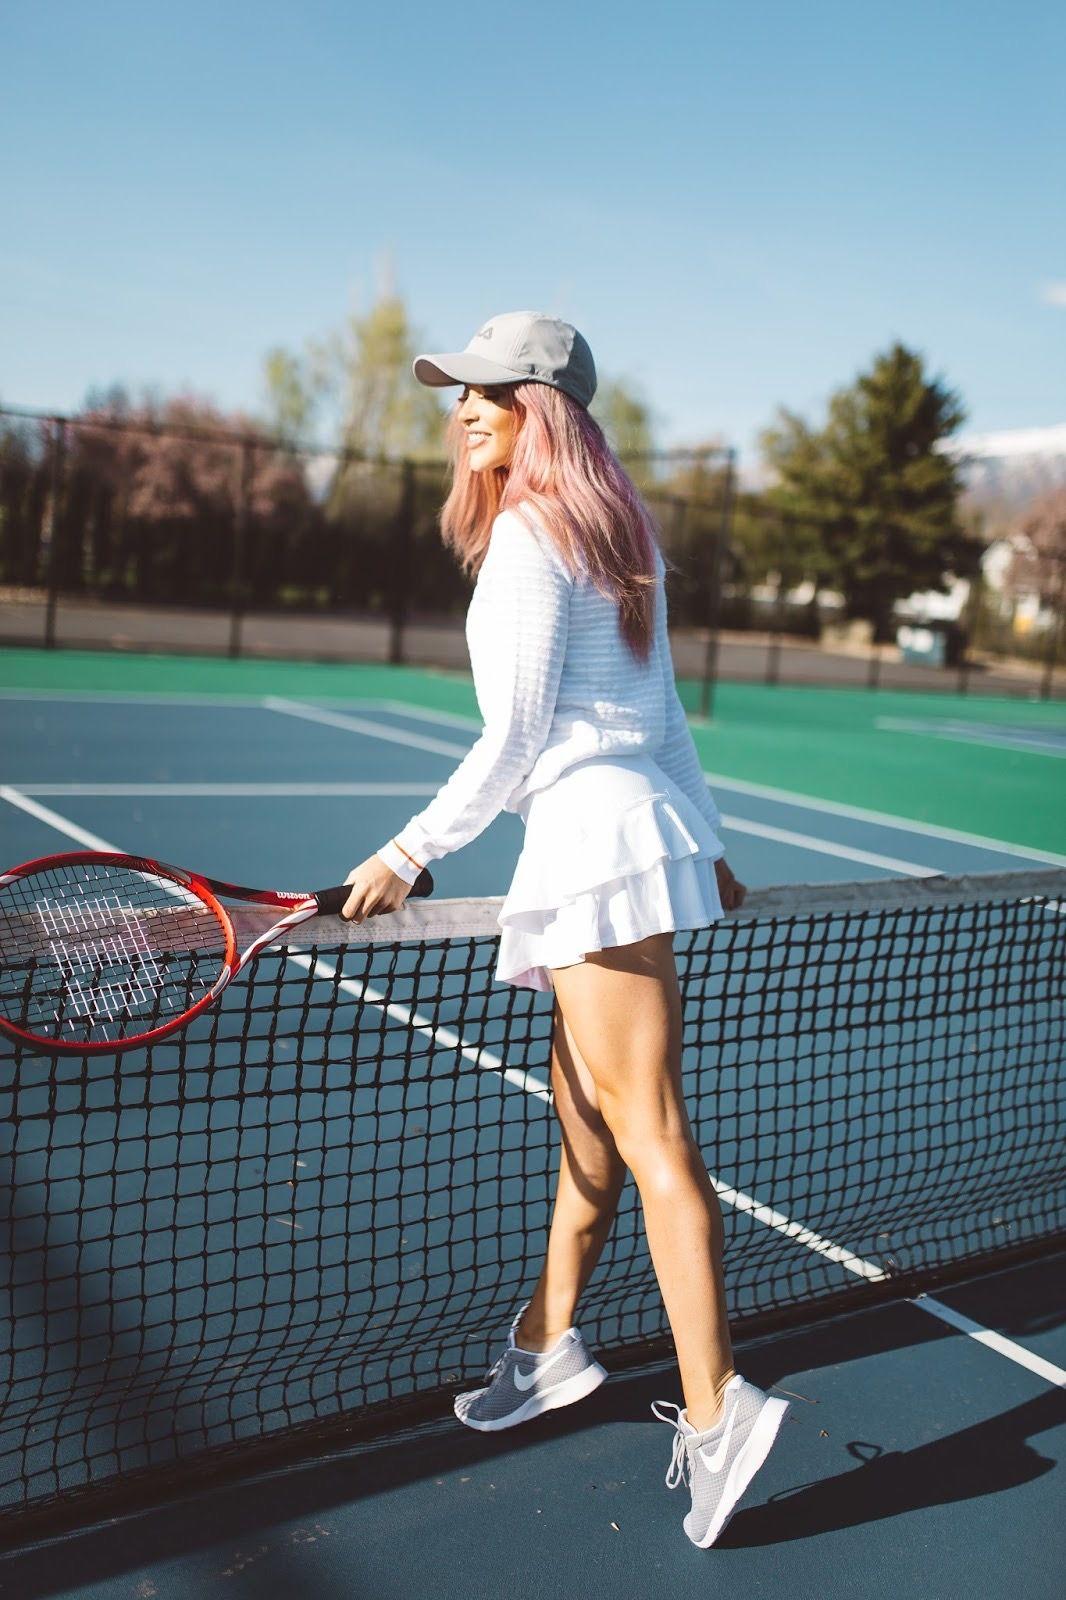 Pin by Erika Moorman on Baby boys   Tennis racket